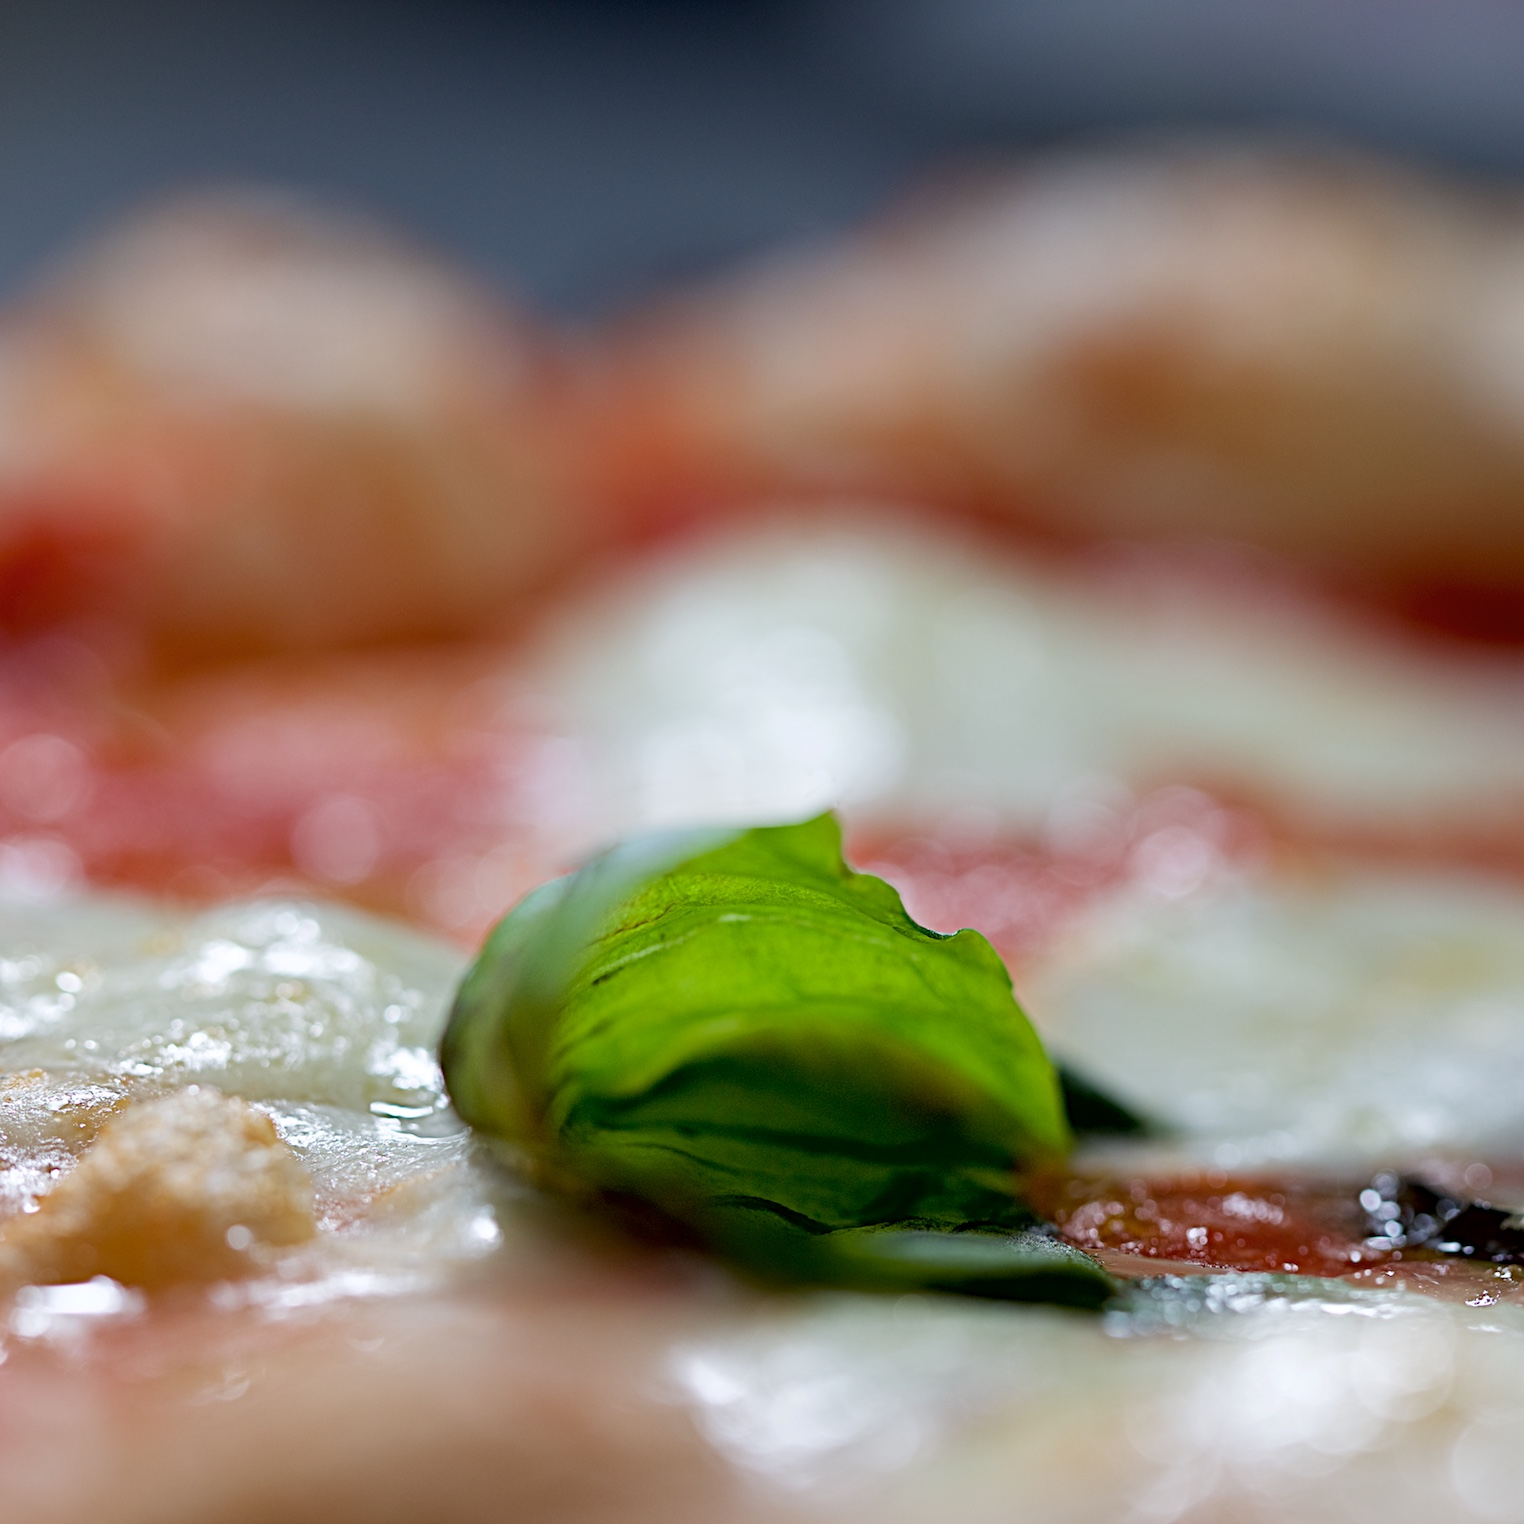 111-Pizzazzà-Nologo_IMG_9889